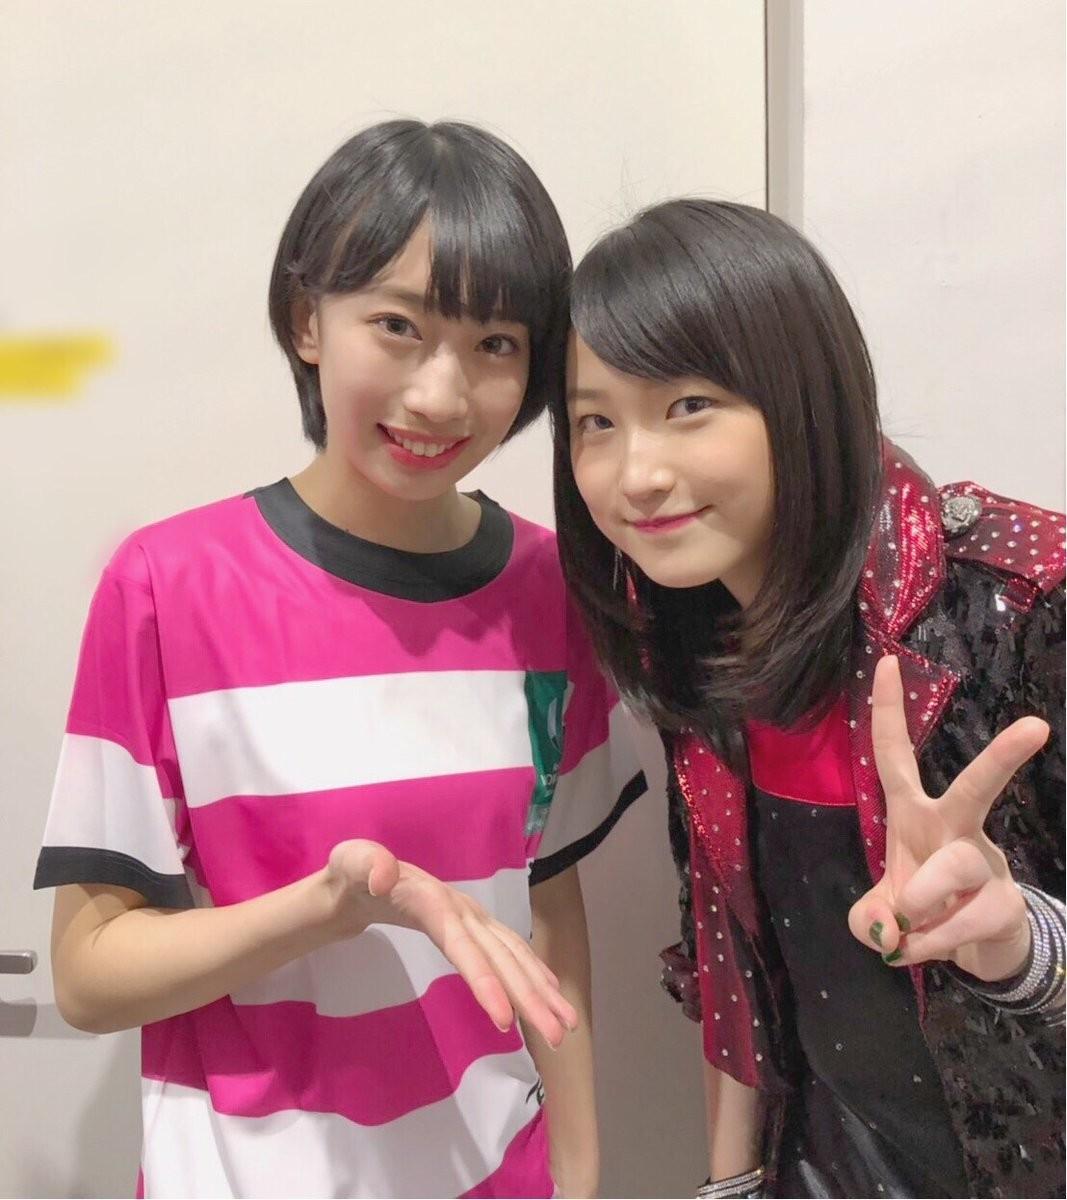 f:id:shuyo:20190331082915j:plain